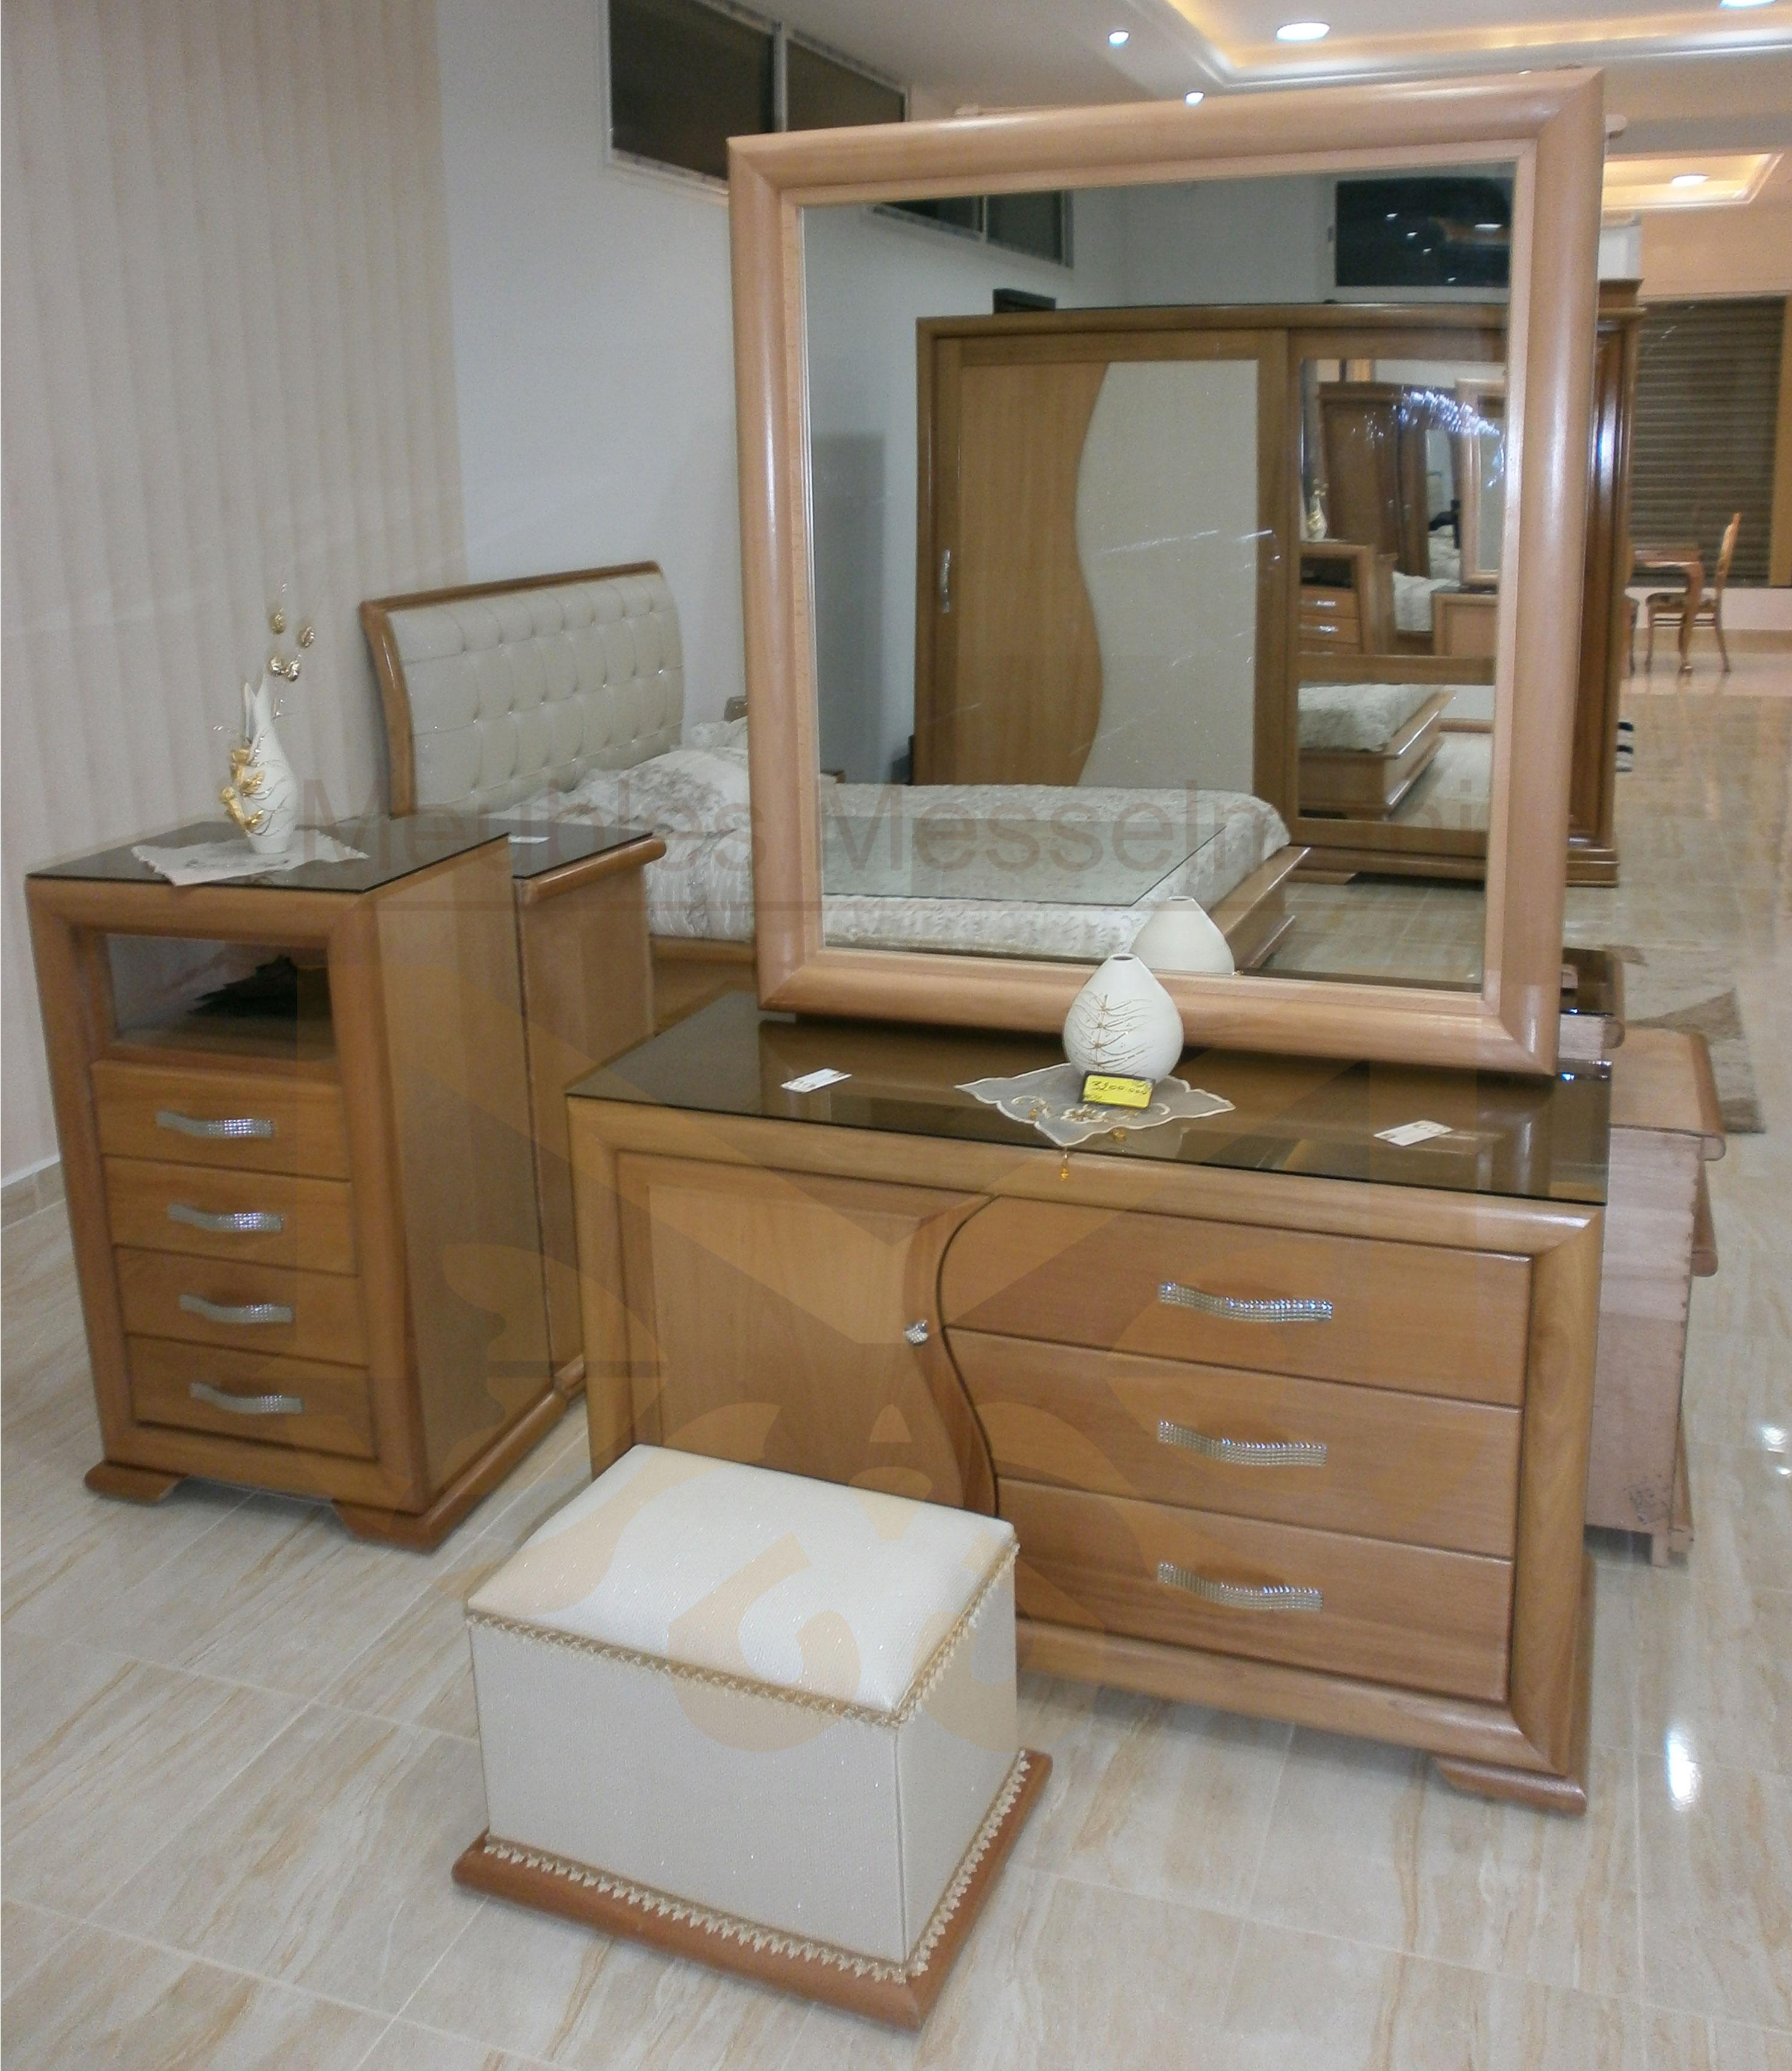 chambre coucher flora meubles k libia messelmani